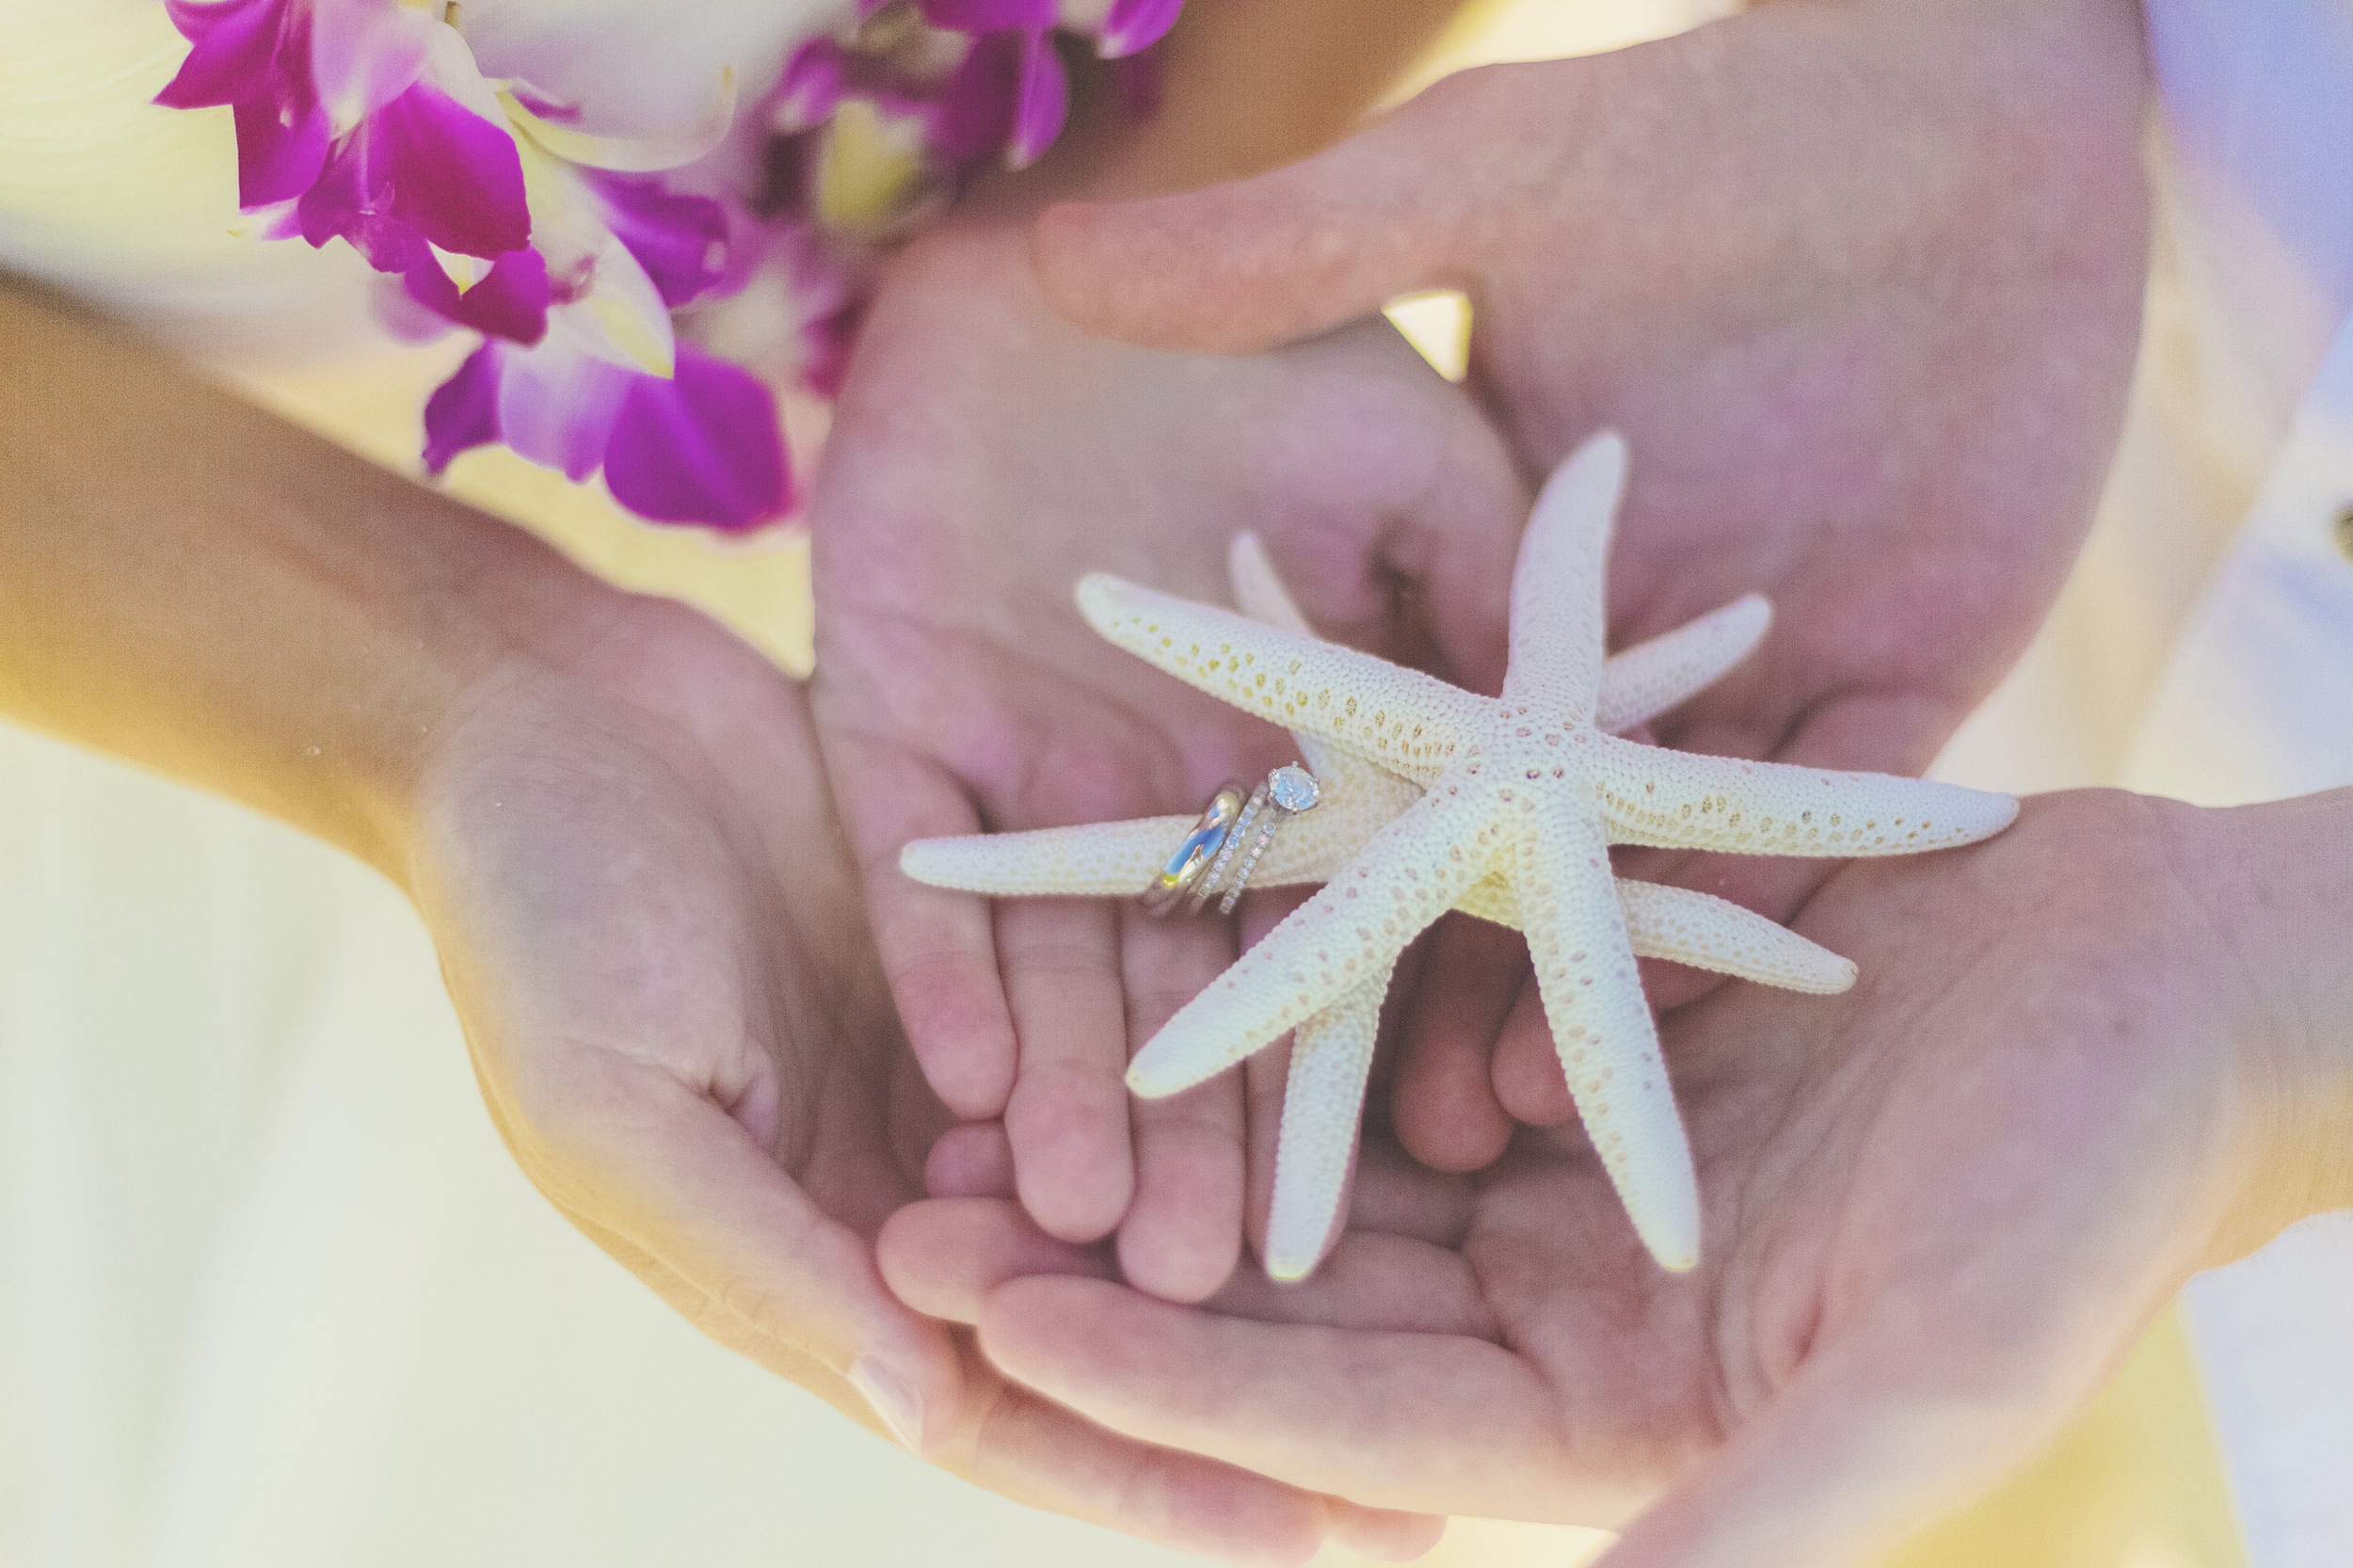 angie-diaz-photography-maui-honeymoon-hawaii-elopement-23.jpg